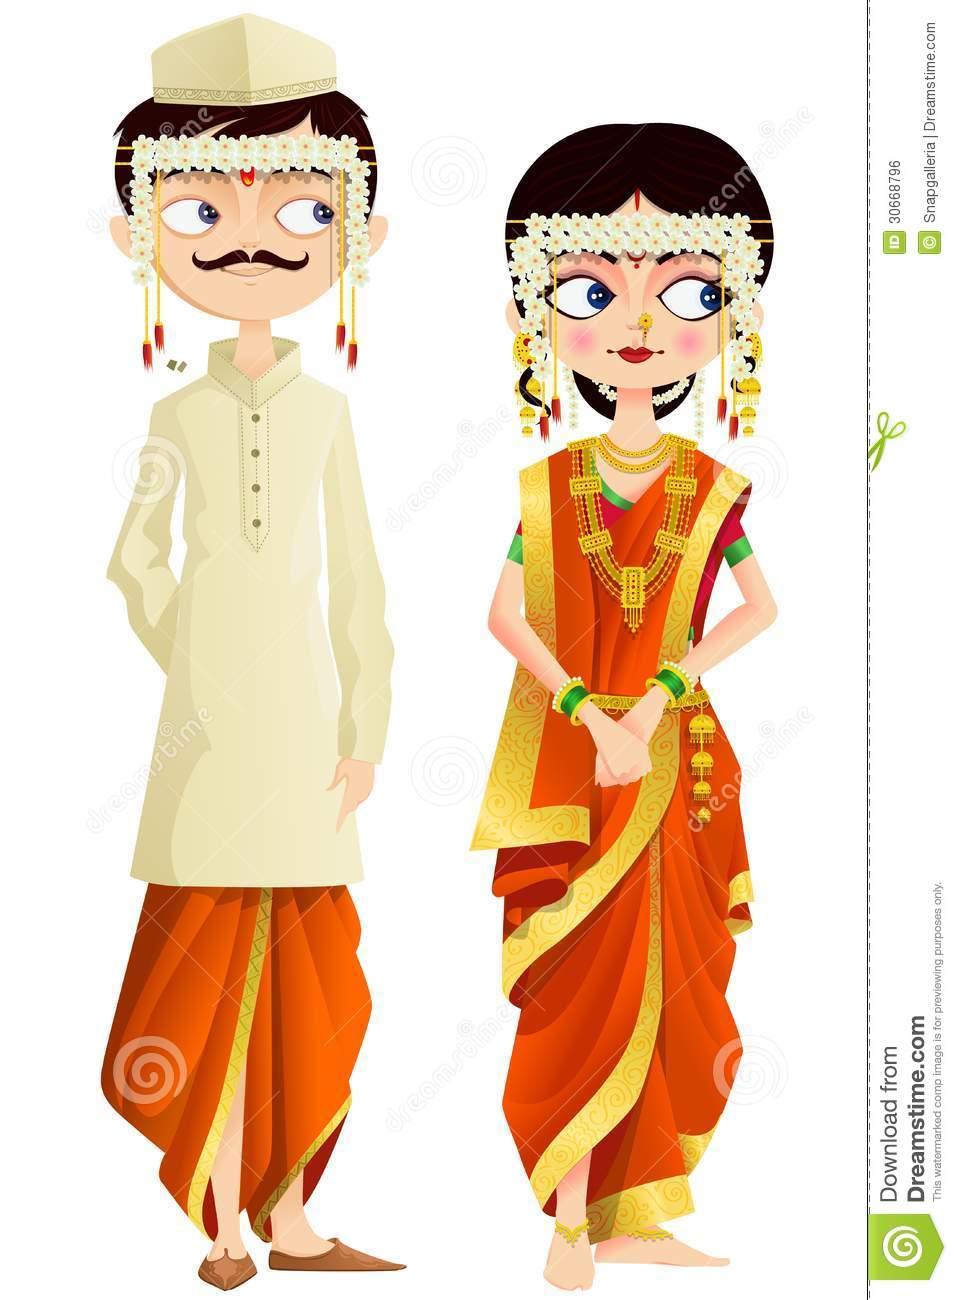 K.o.p.e.l. clipart marathi Clipart Wedding 05 Art Marathi